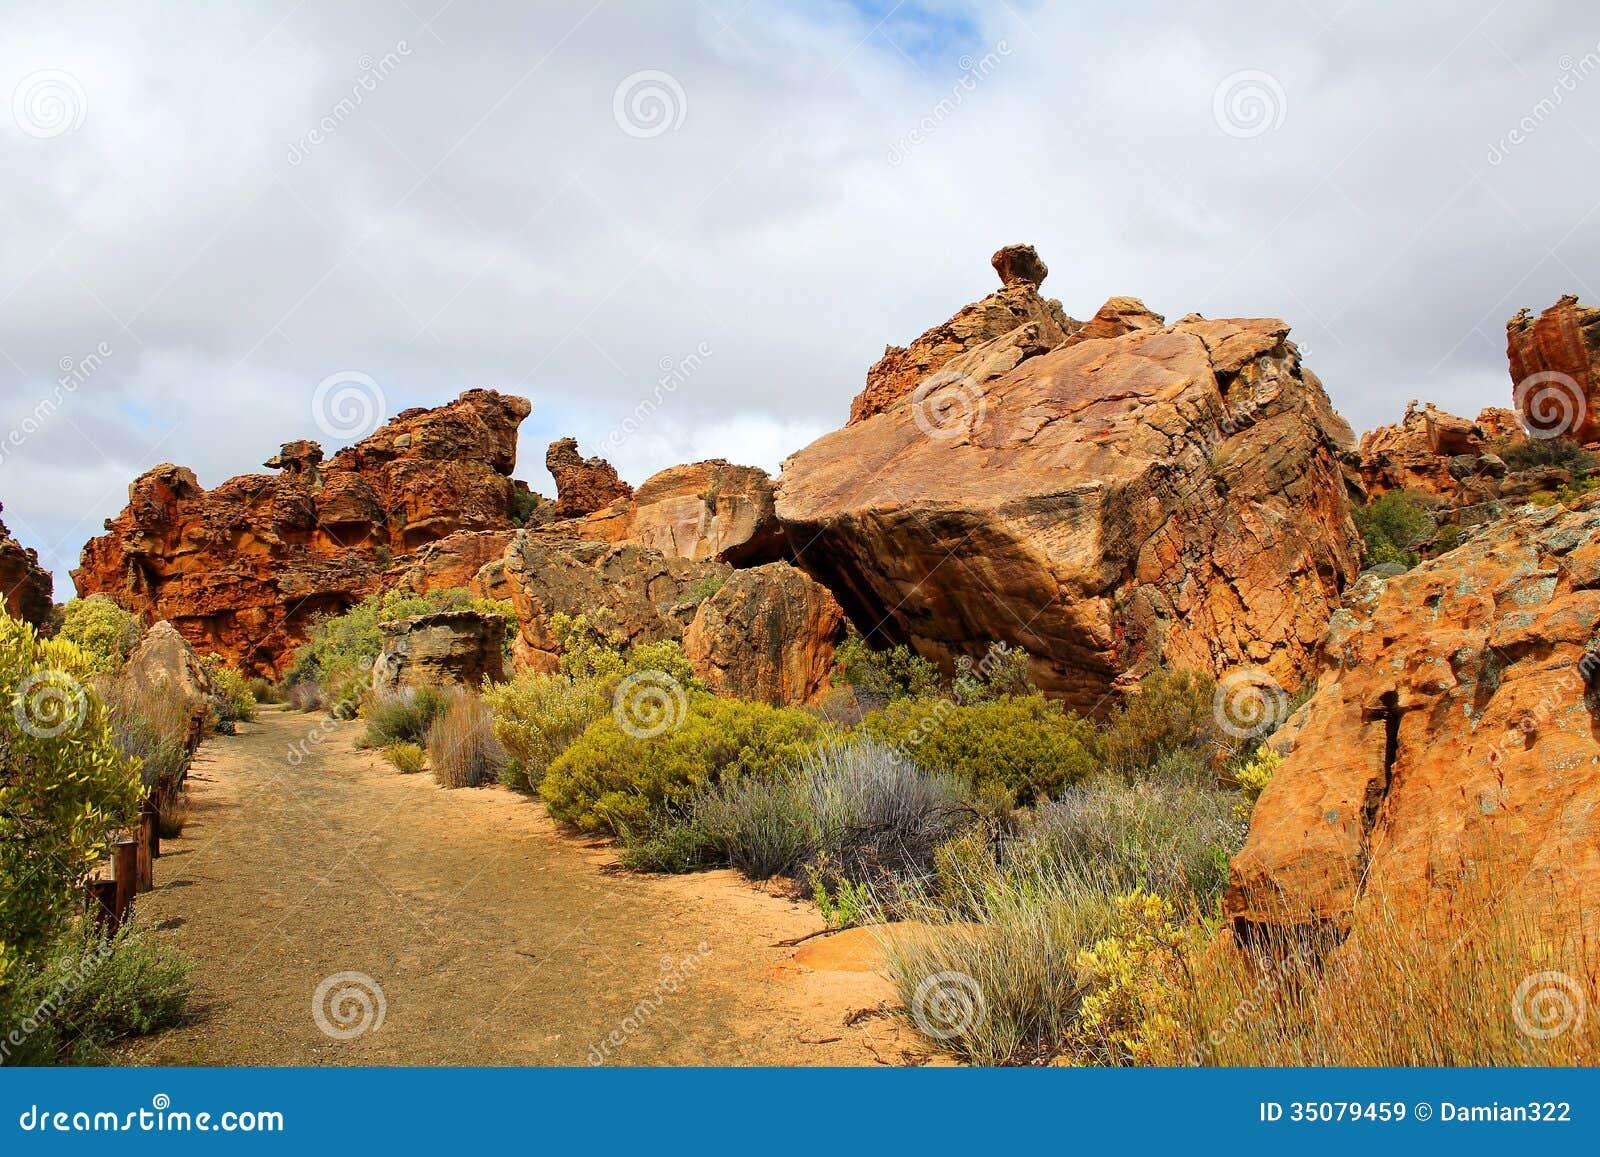 Stadsaal caves landscape in the cederberg south africa for Landscape sa